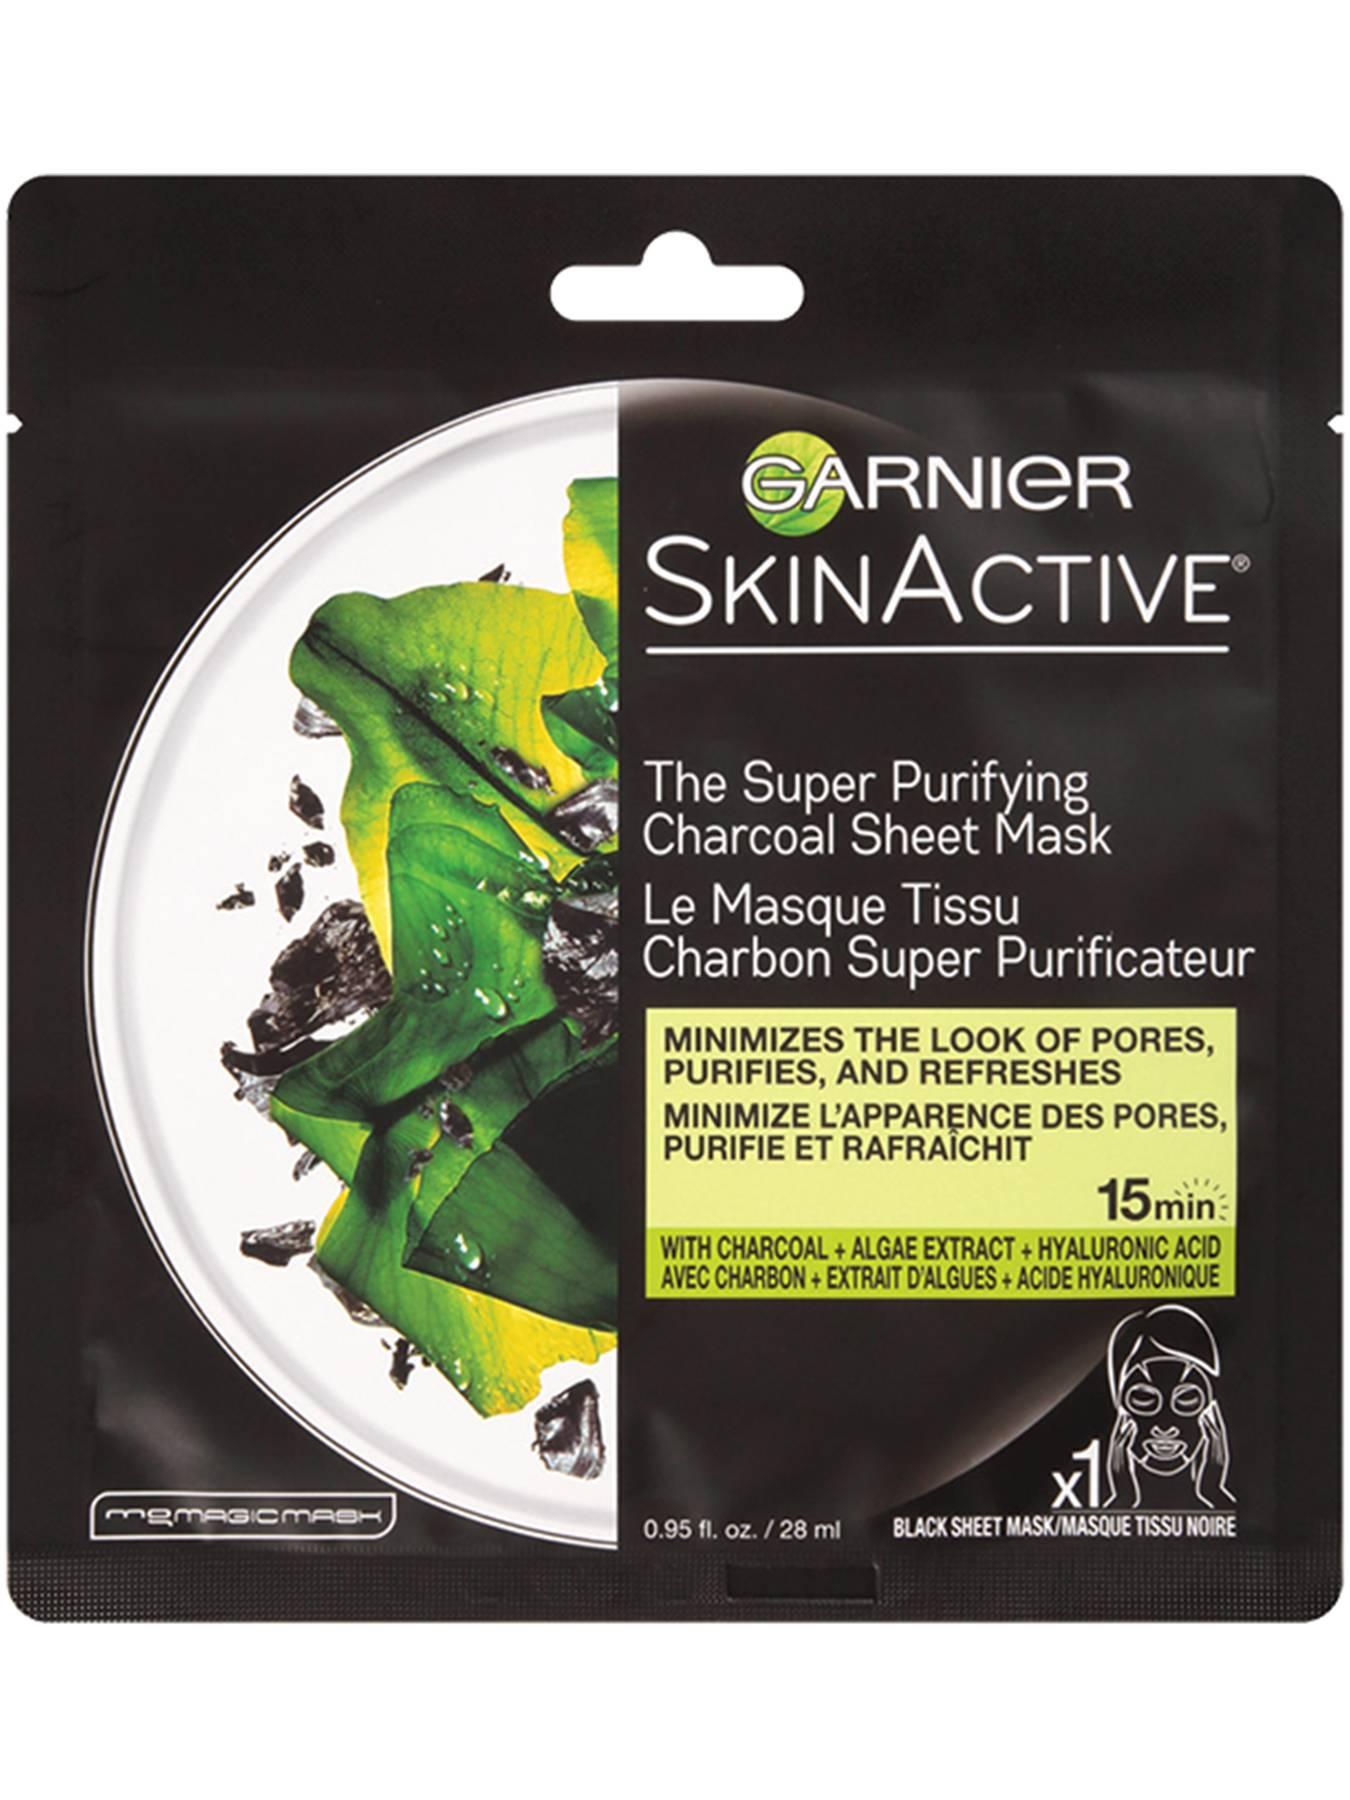 Super Purifying Charcoal Sheet Face Mask Garnier Skinactive